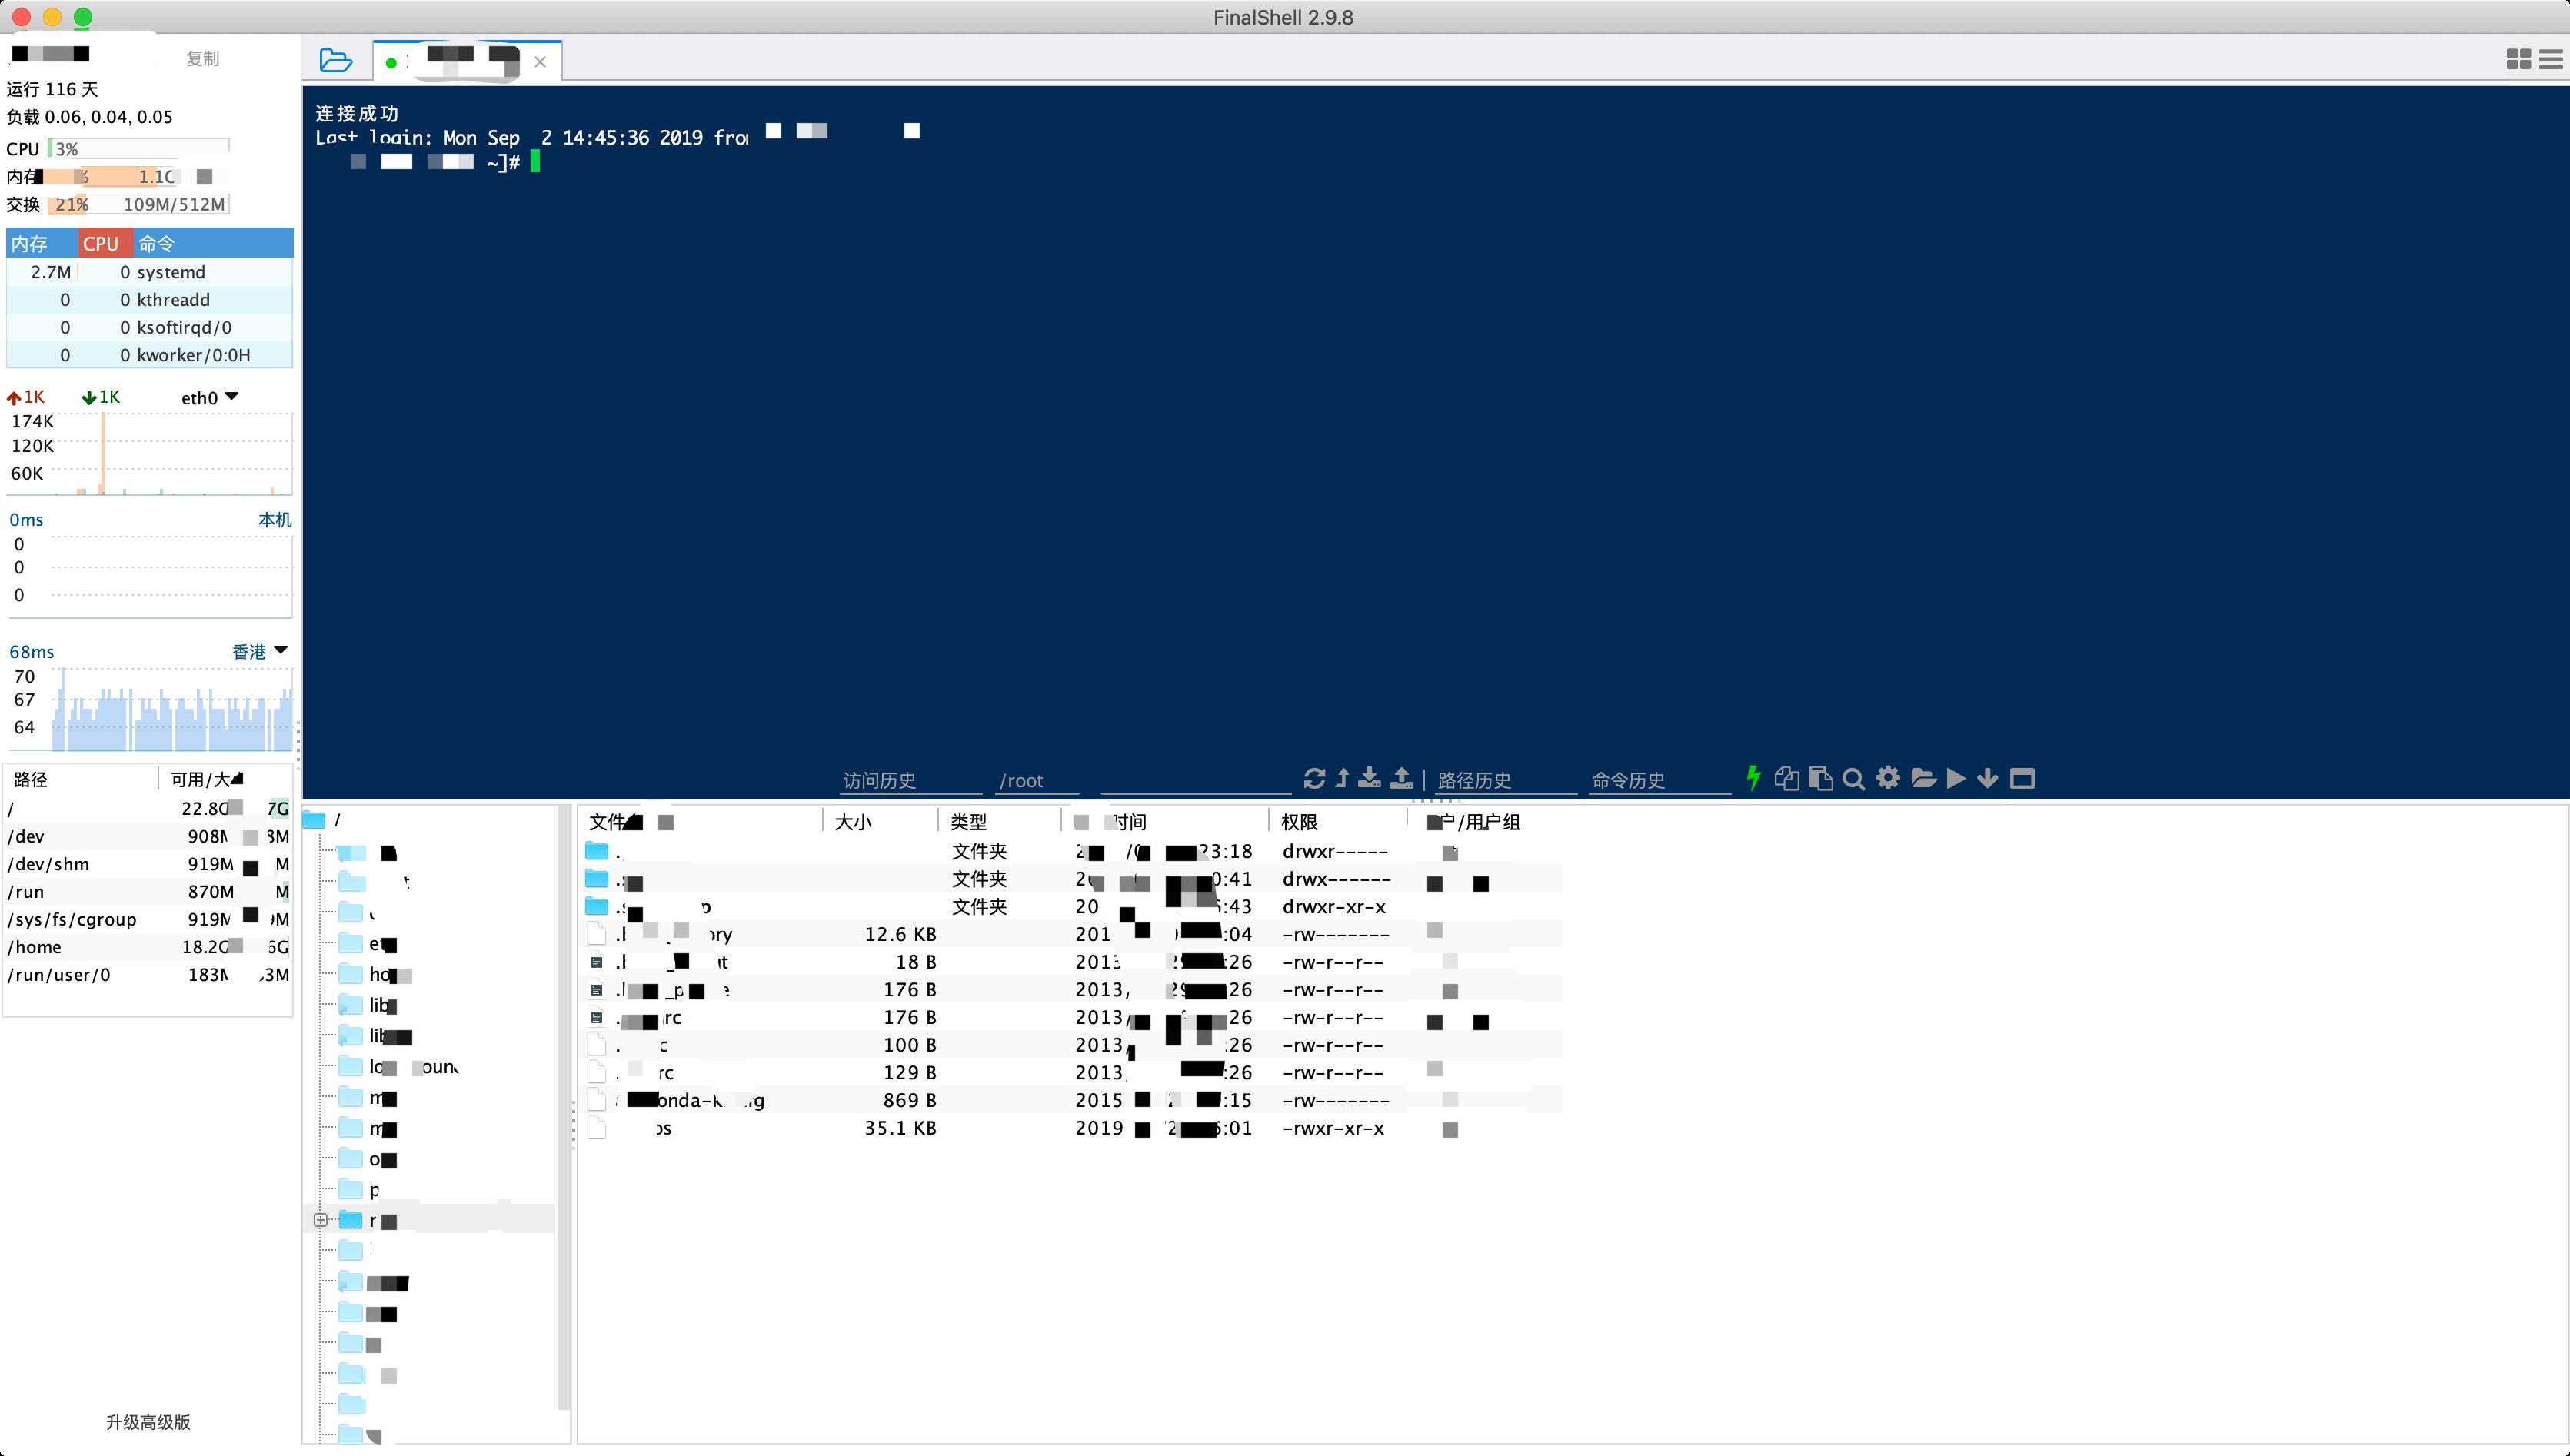 macOS 优秀应用分享一:FinalShell,macOS 上的 SSH 终端良心神器的图片-高老四博客